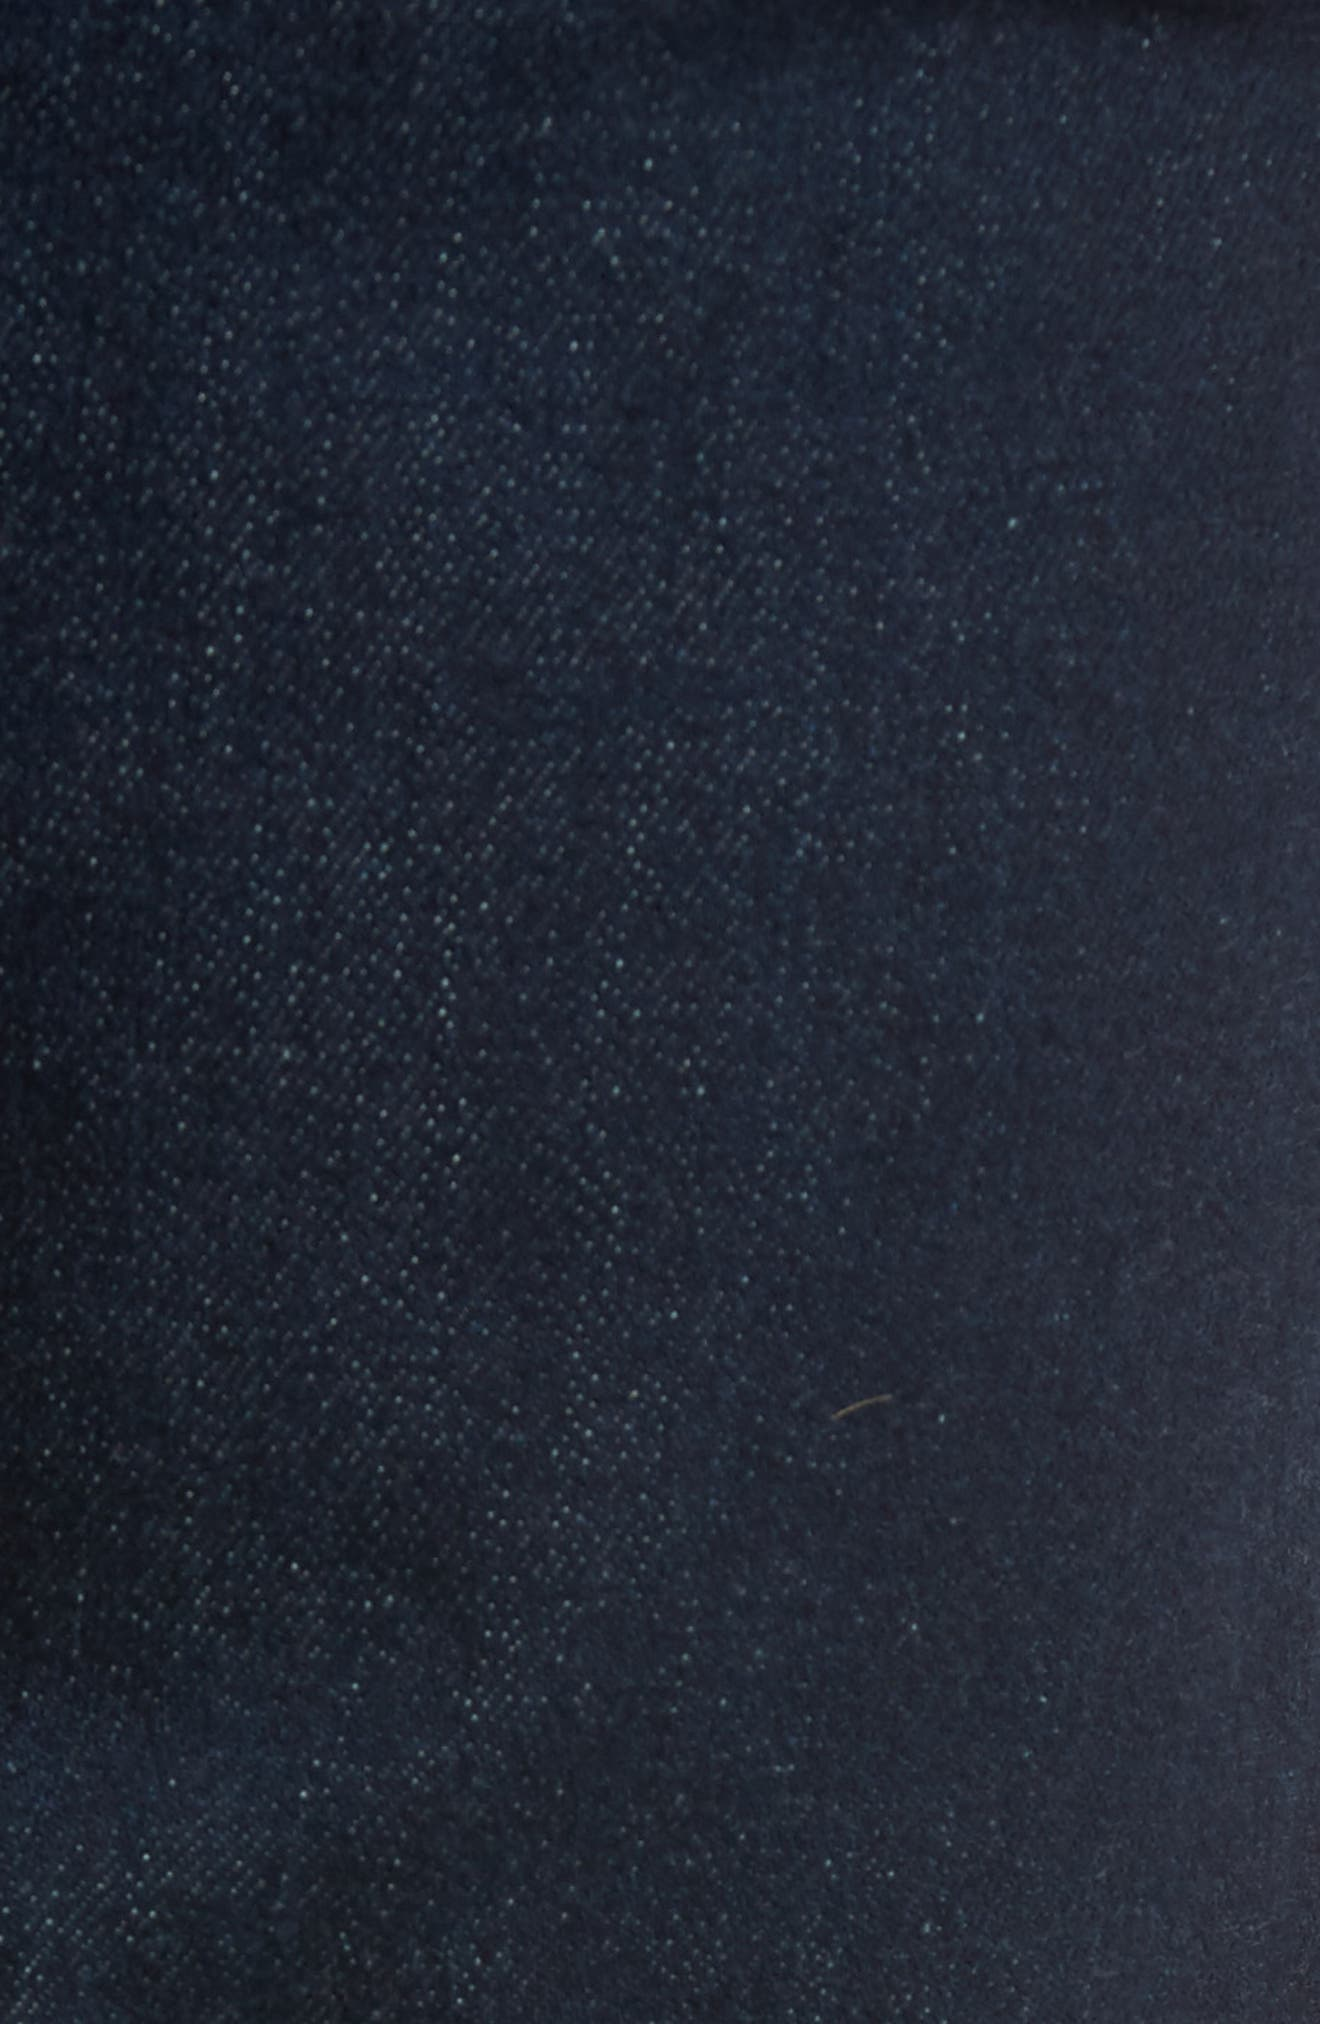 Blake Slim Fit Jeans,                             Alternate thumbnail 5, color,                             Firebrand